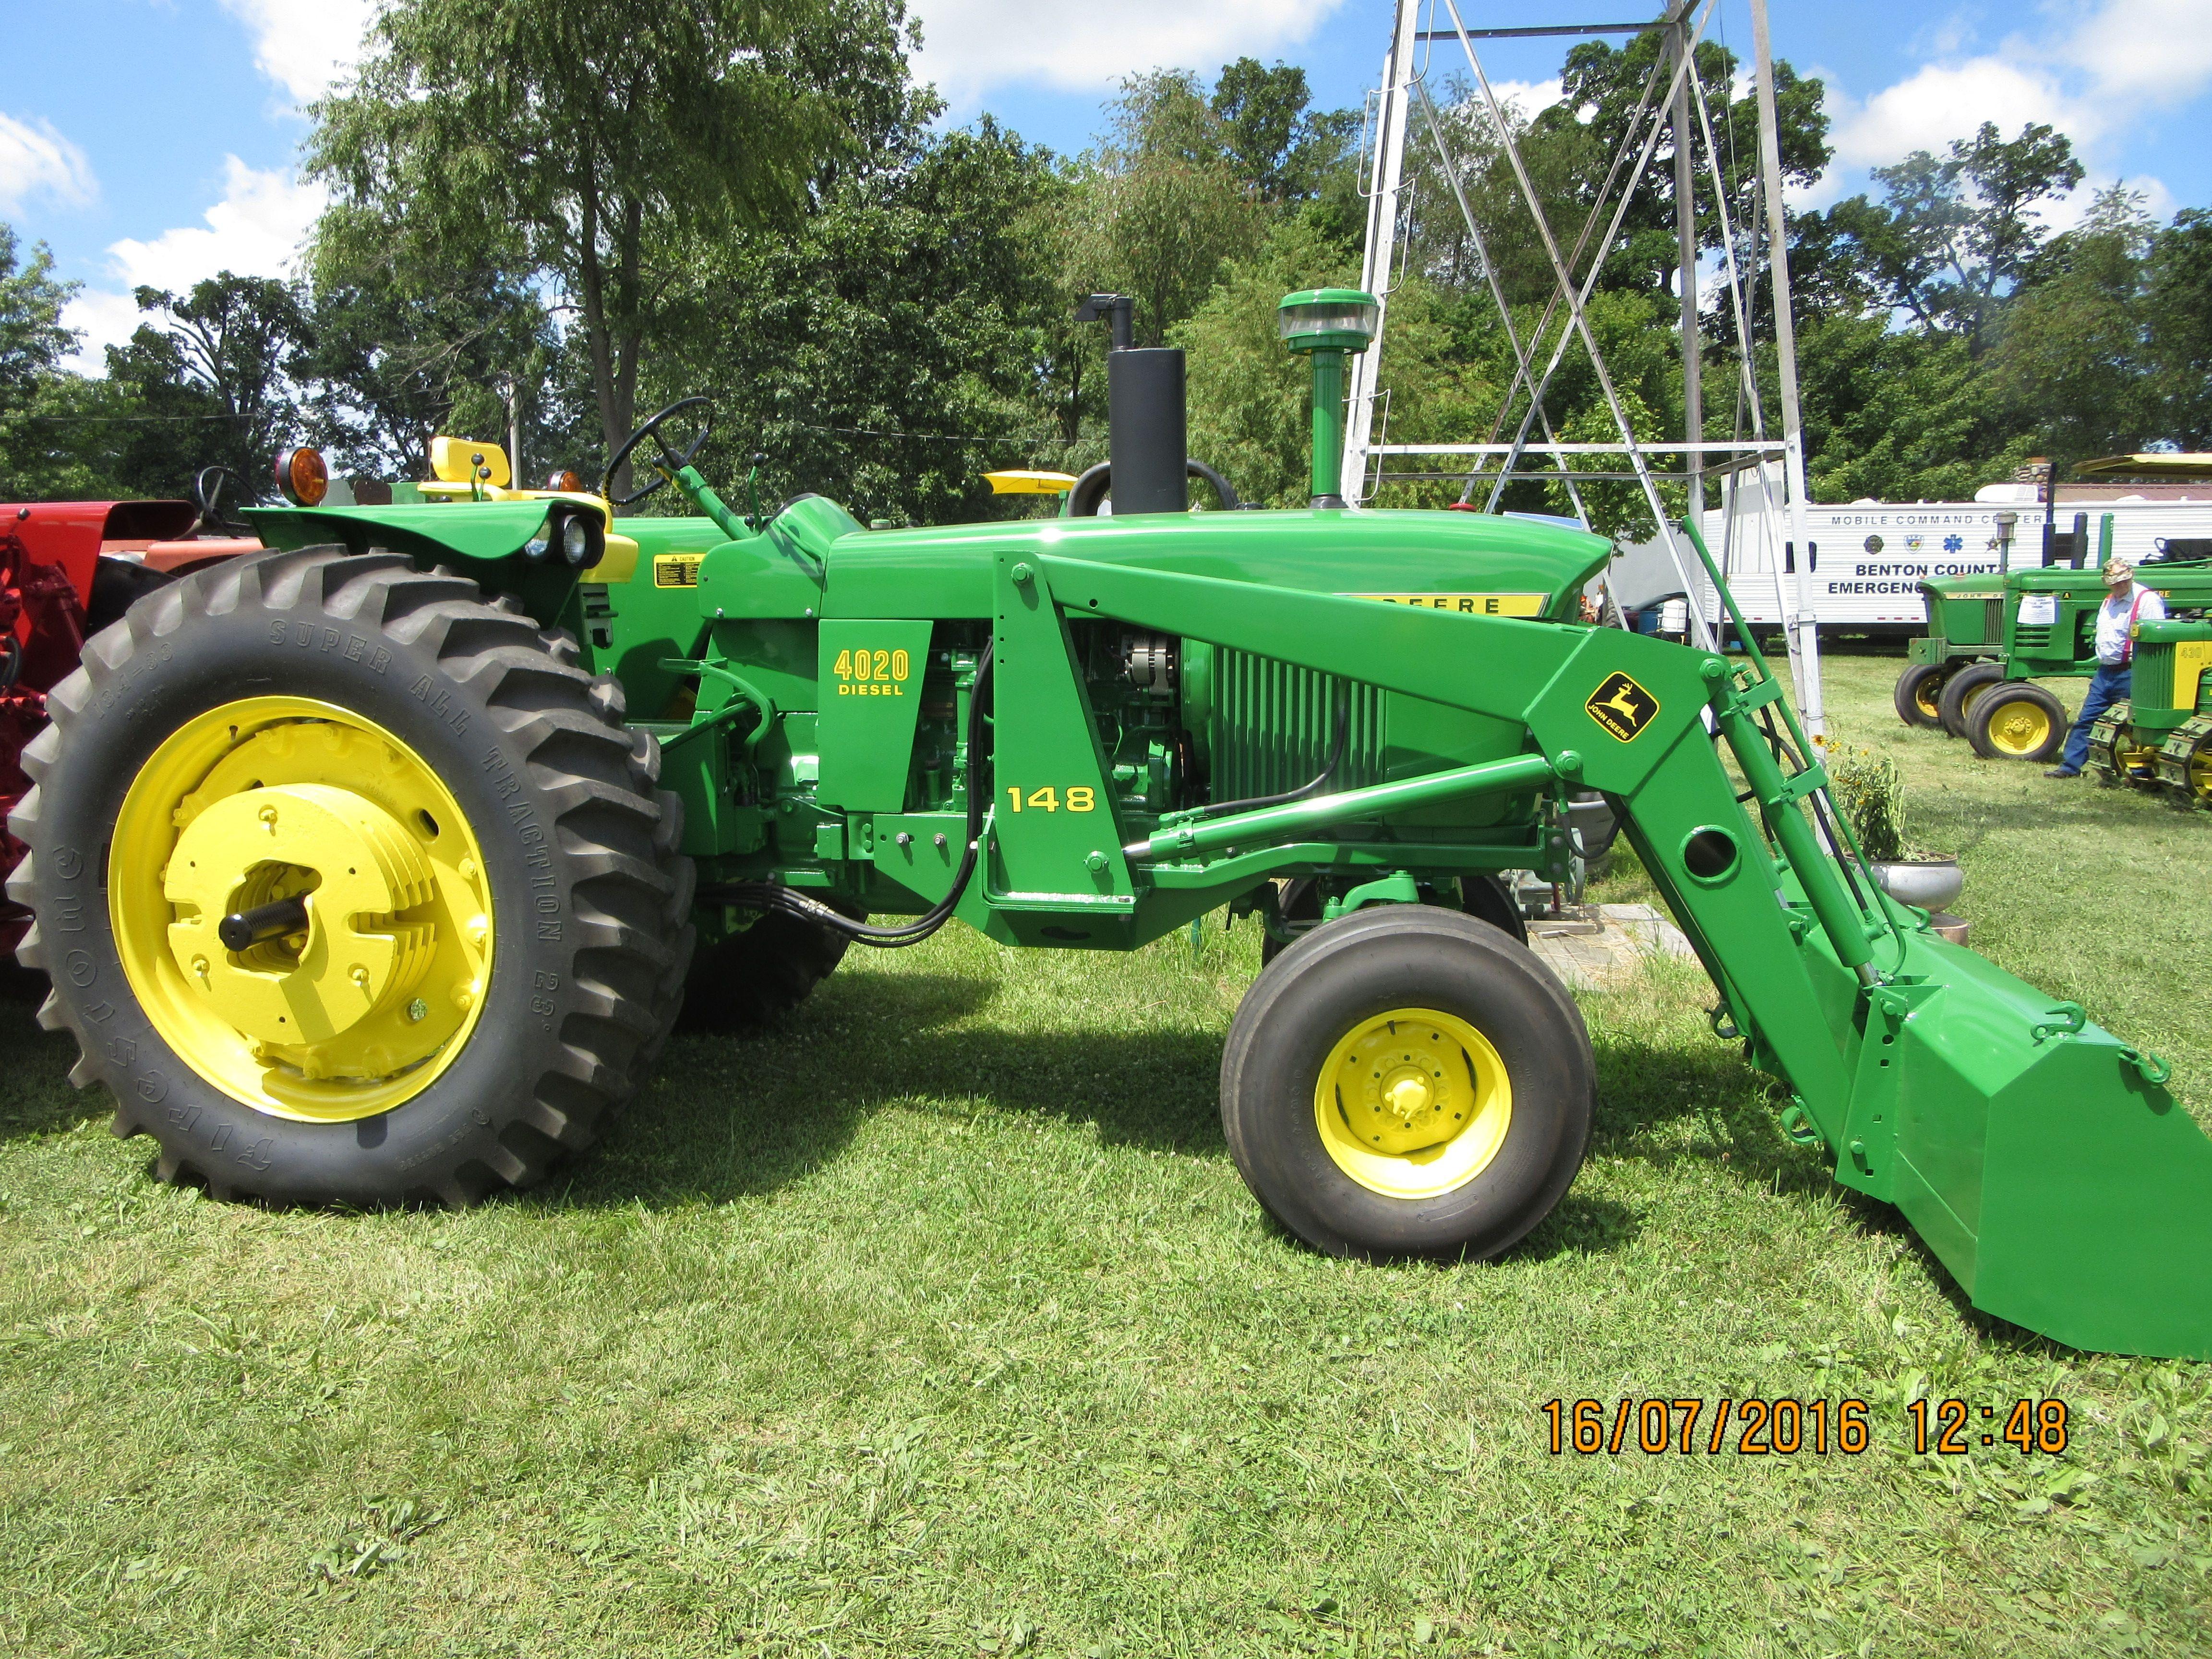 John Deere 4020 Fuses Tractors John Deere Of John Deere 4020 Fuses